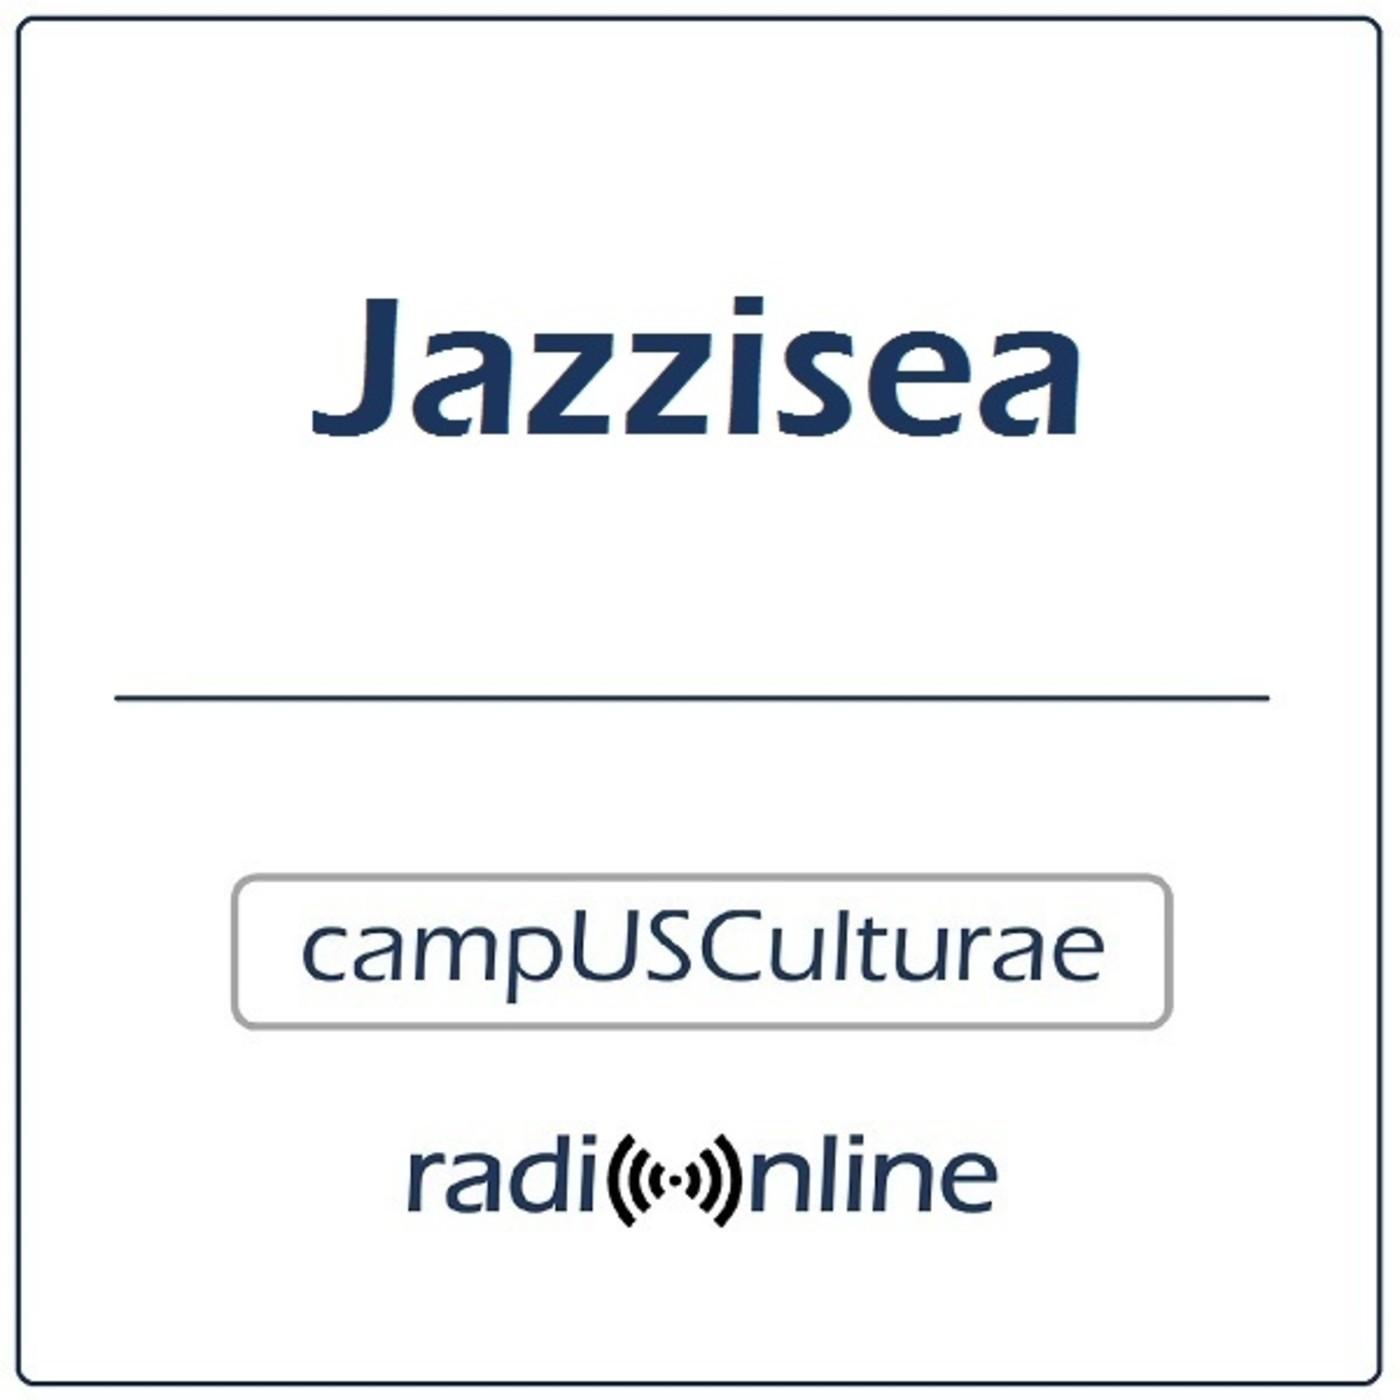 Jazzisea 003 (29-09-2017)